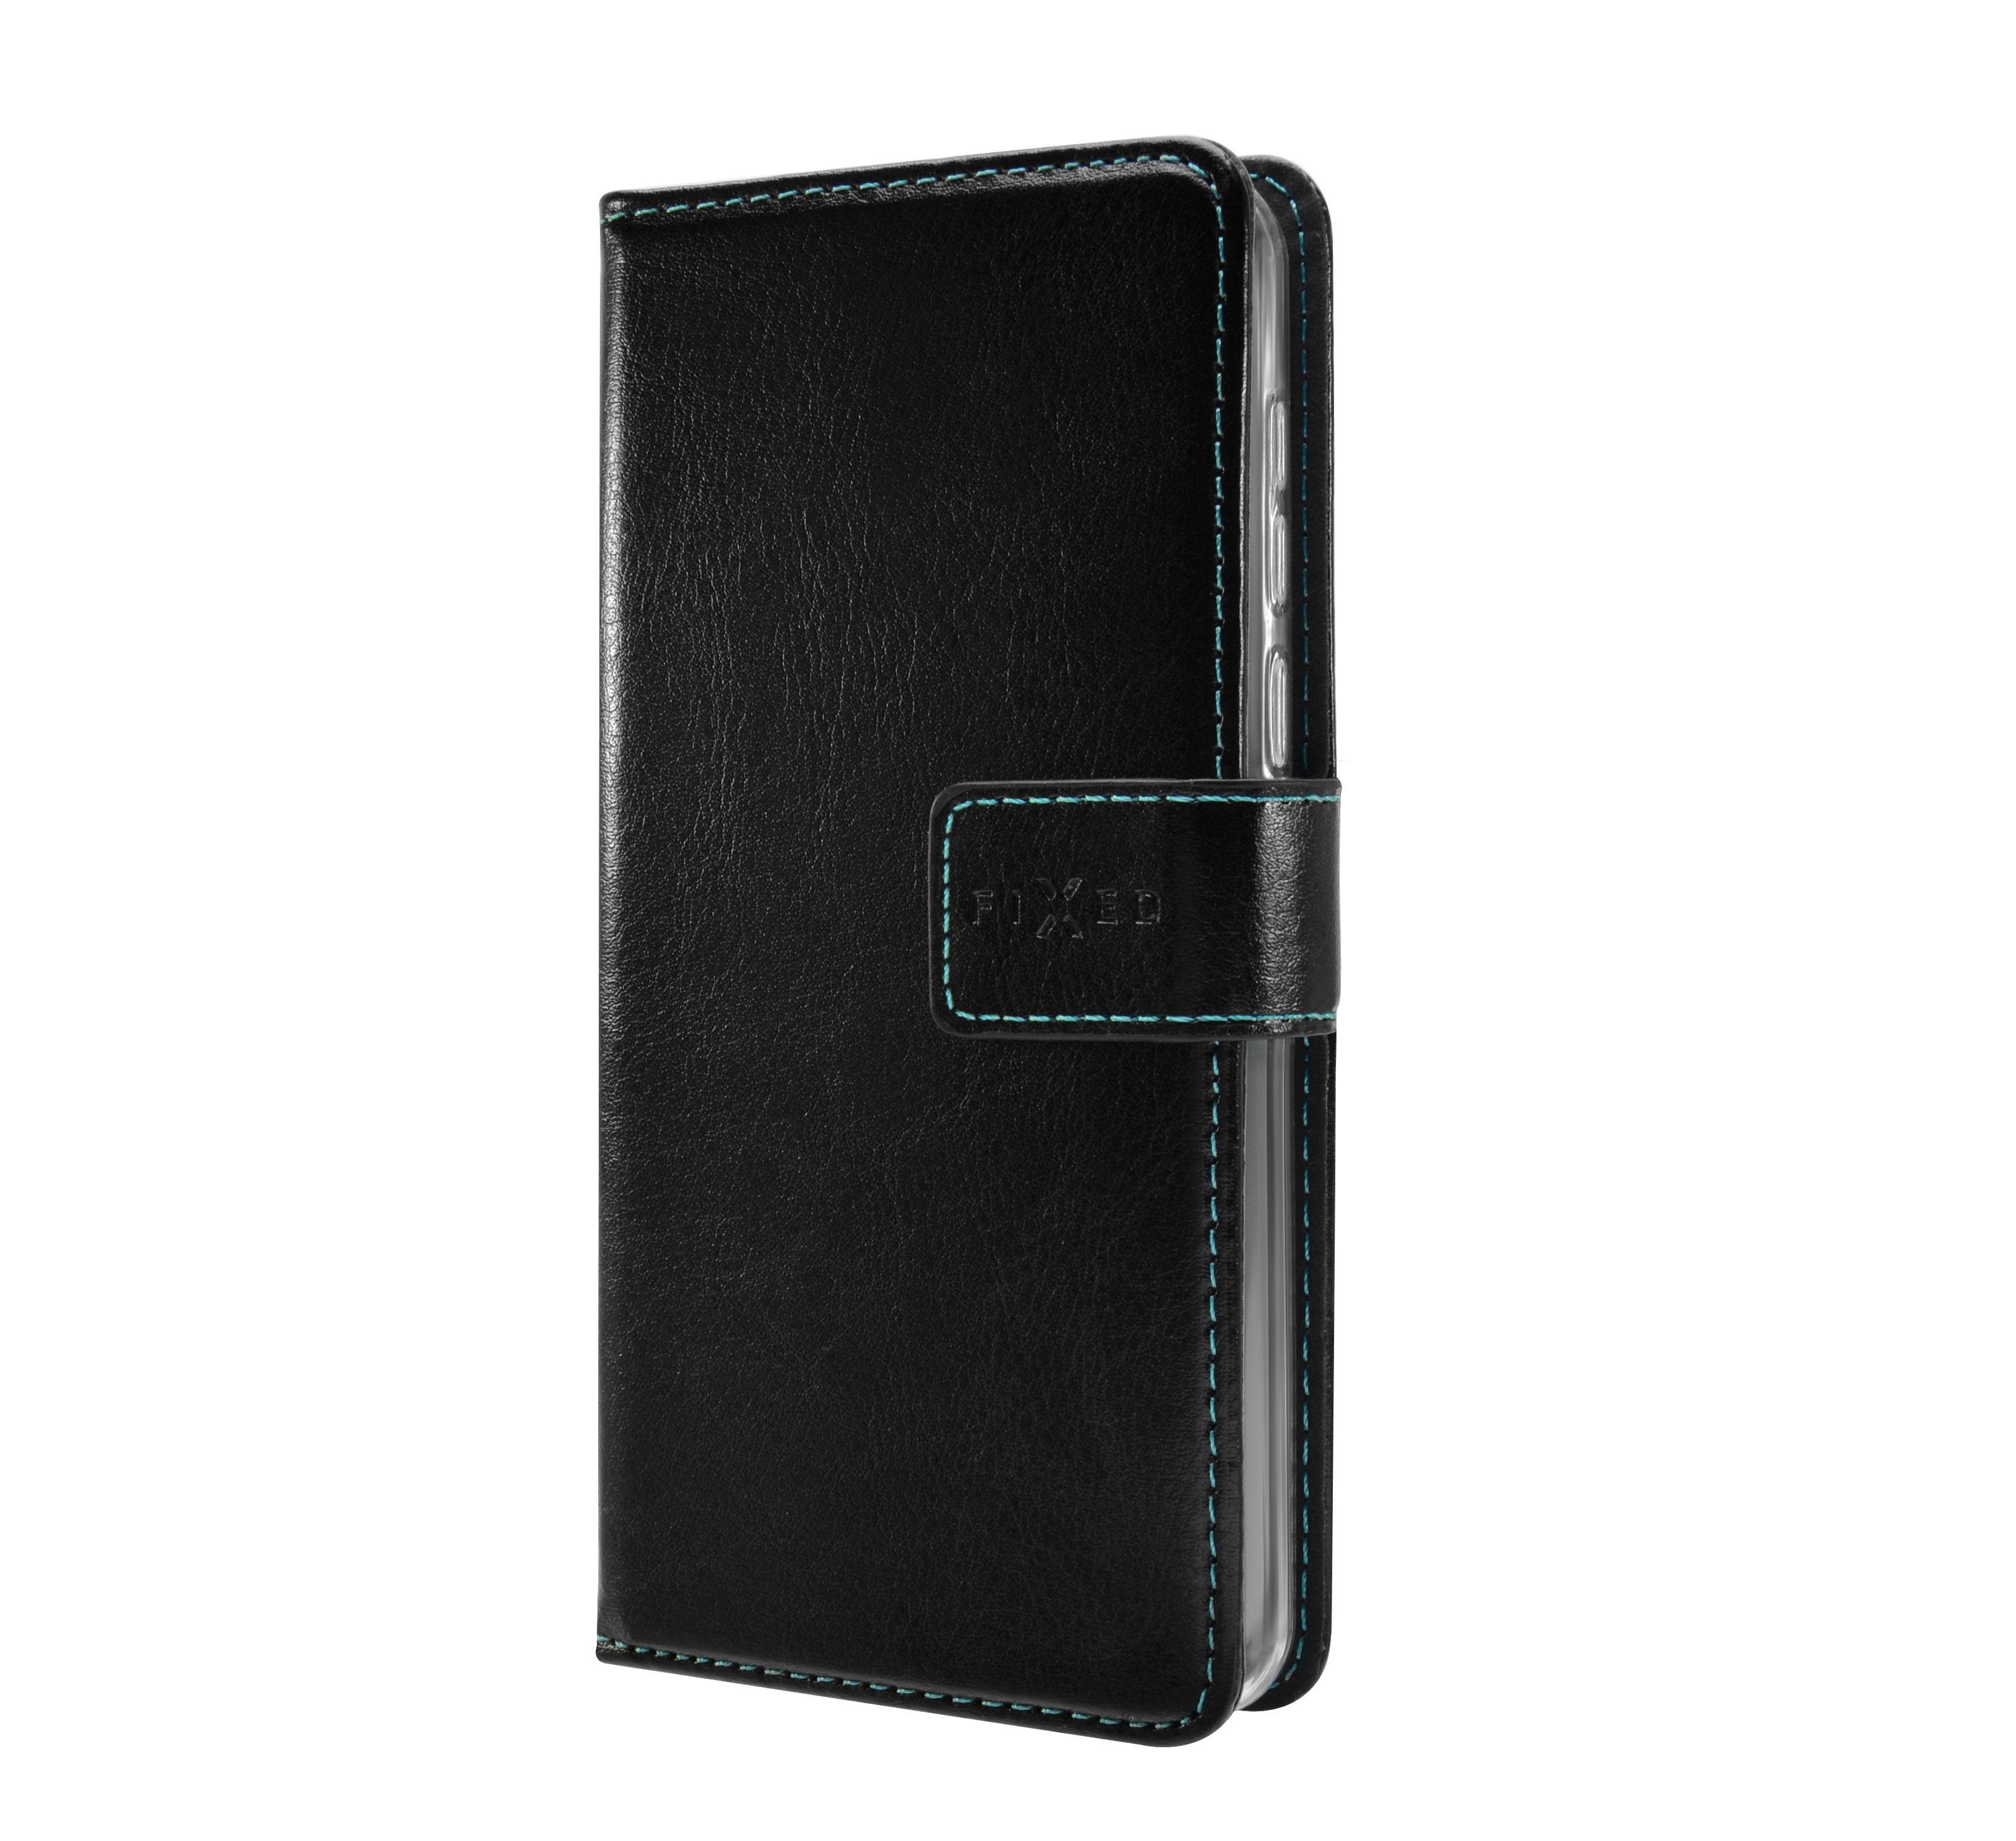 FIXED Opus flipové pouzdro pro Sony Xperia XZ3, černé